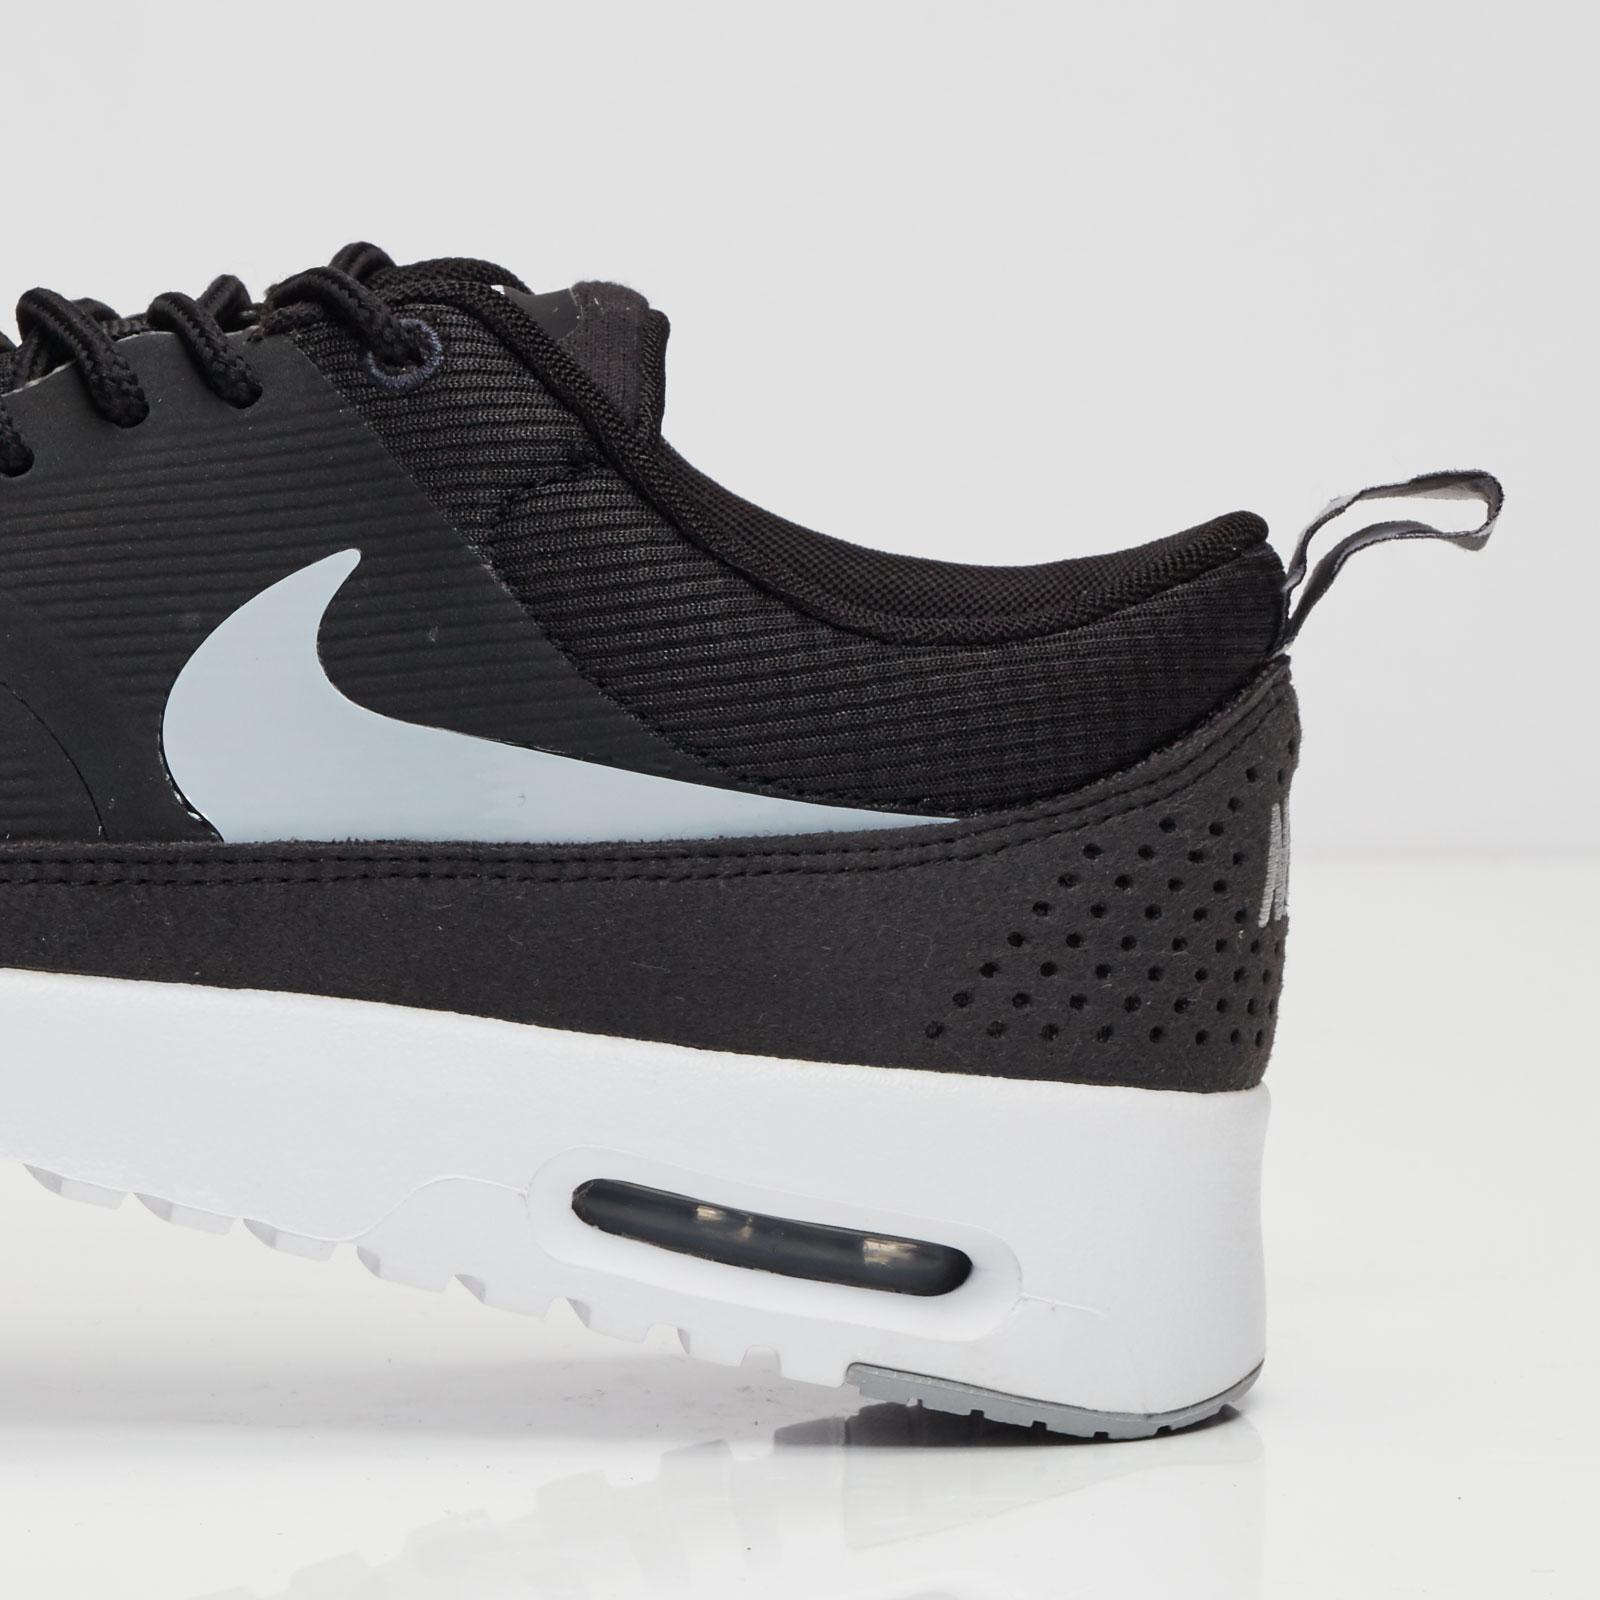 599409 007 BlackWolf Grey Anthracite White Nike Air Max